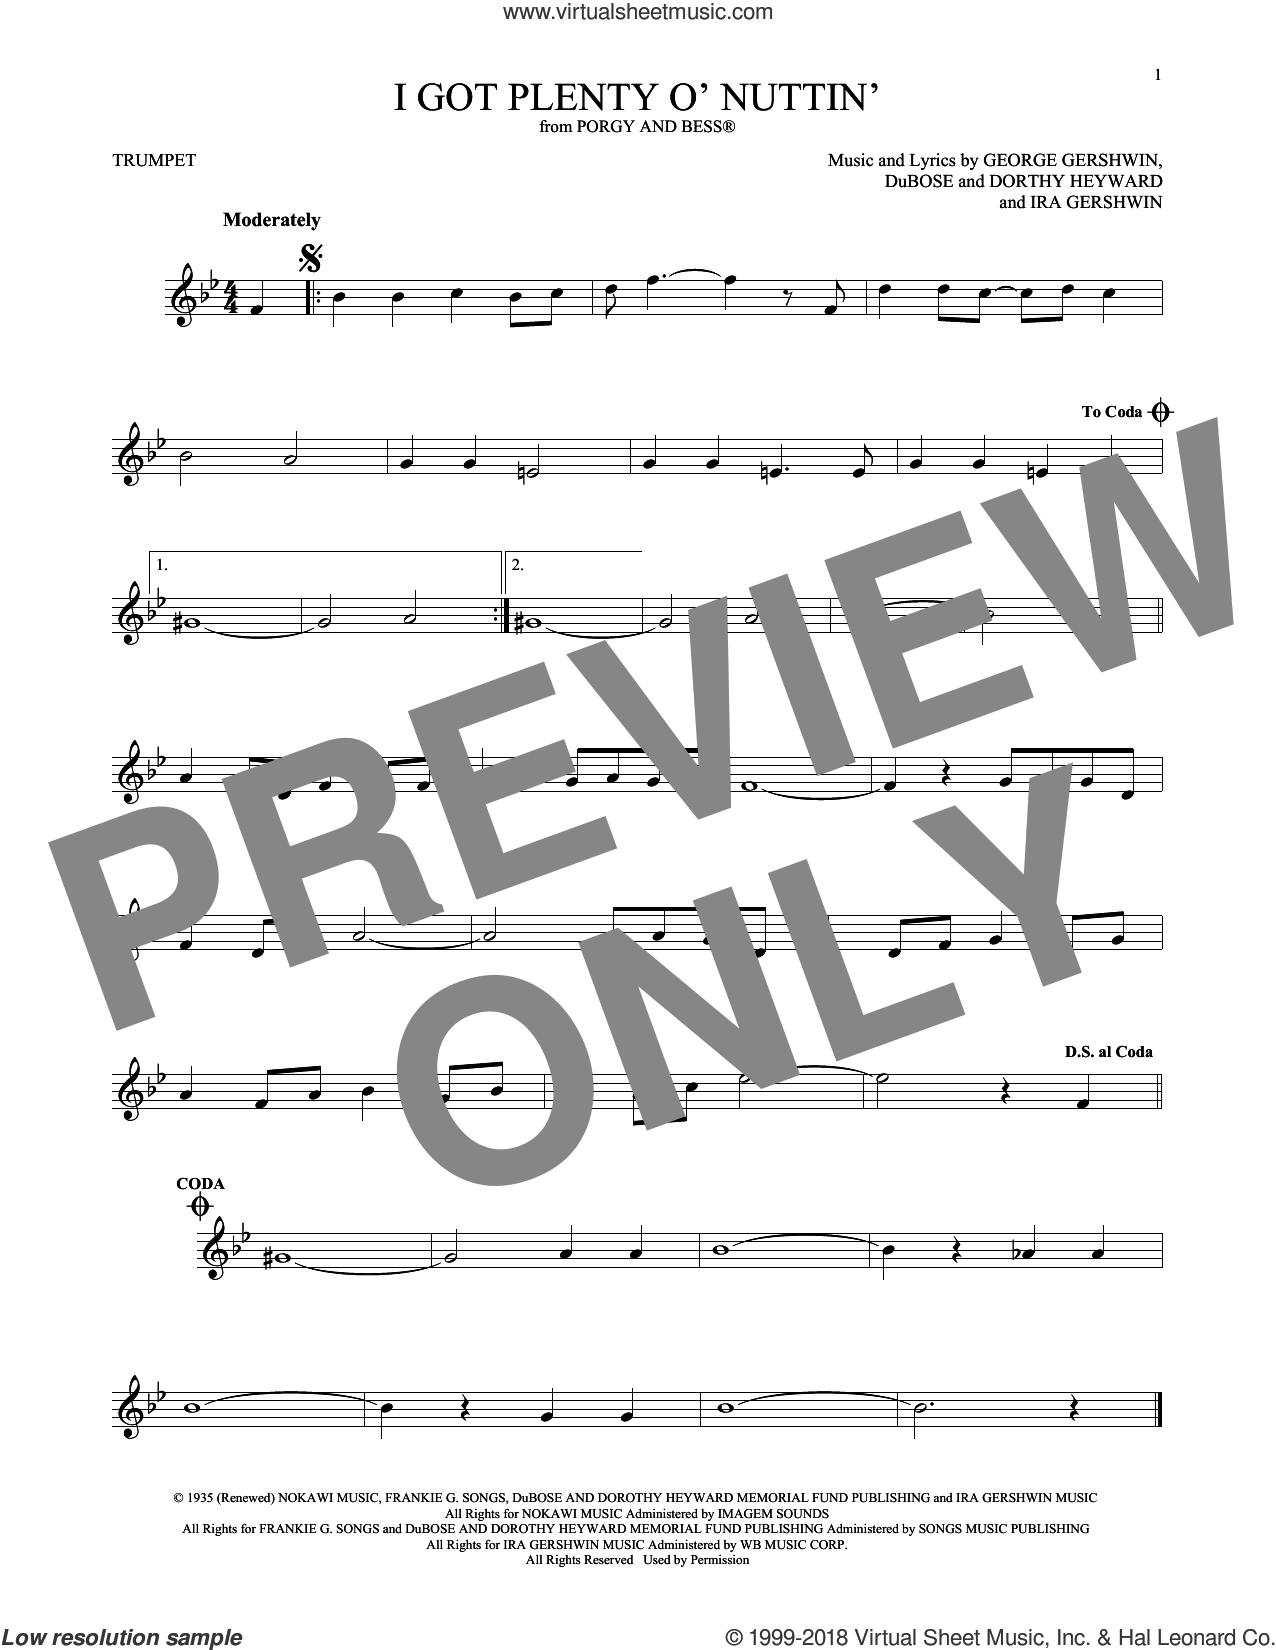 I Got Plenty O' Nuttin' sheet music for trumpet solo by George Gershwin, Dorothy Heyward, DuBose Heyward and Ira Gershwin, intermediate skill level